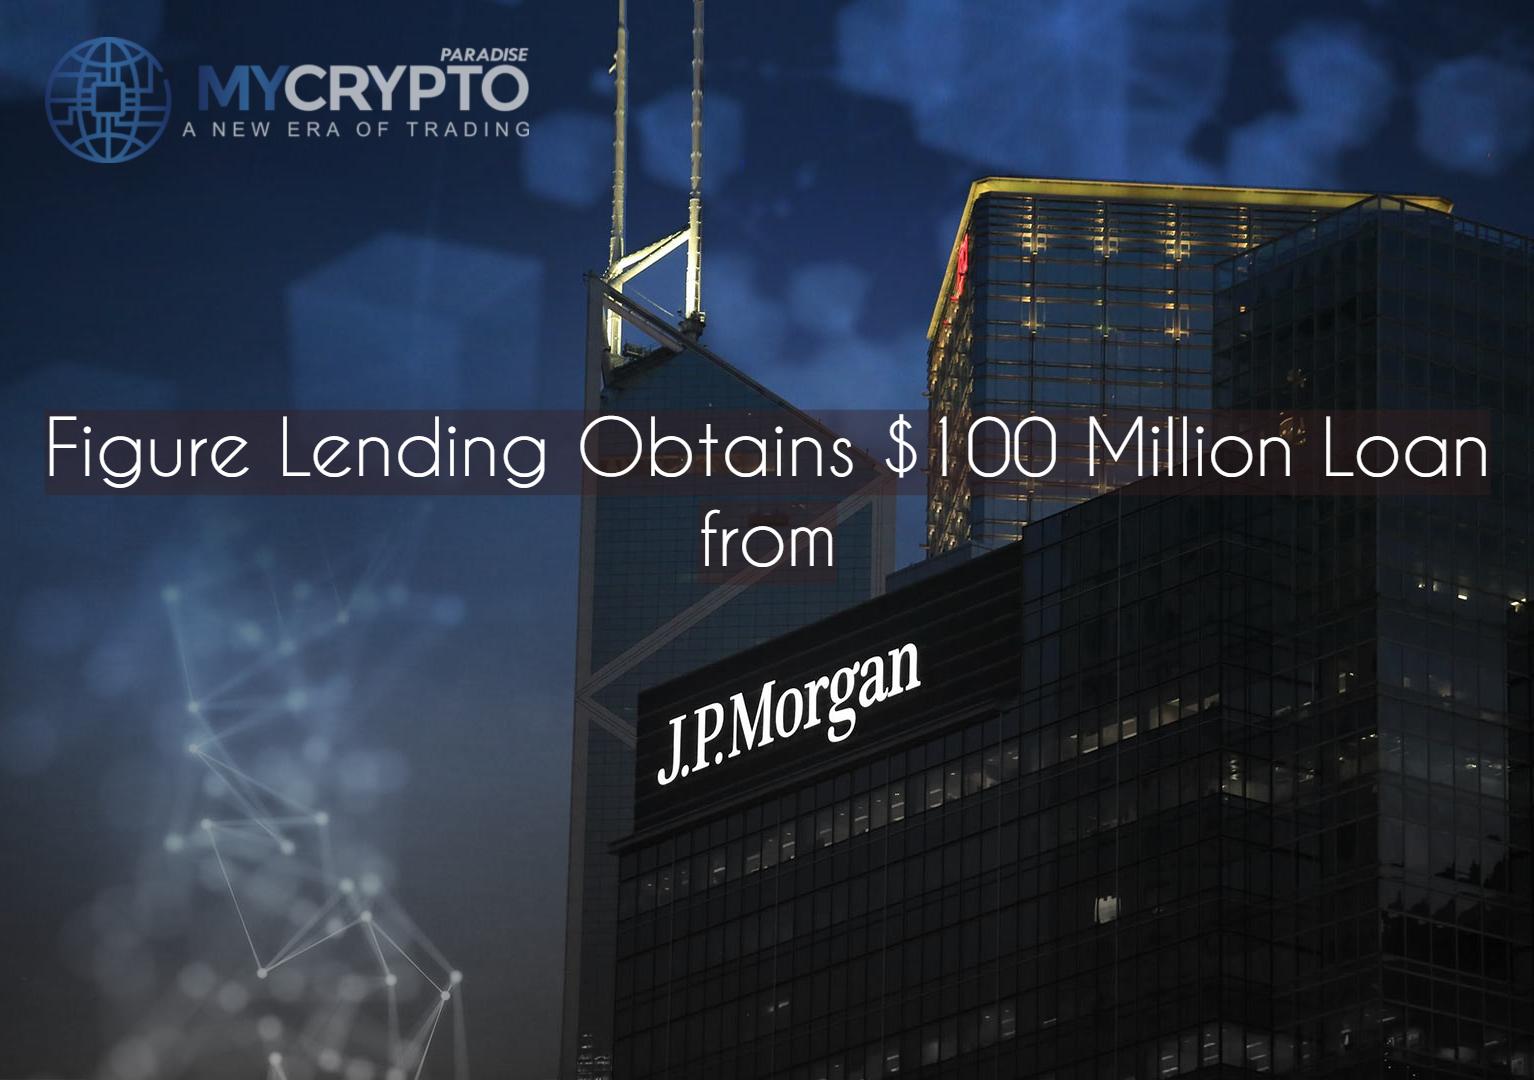 JPMorgan loans Figure Lending $100 Million